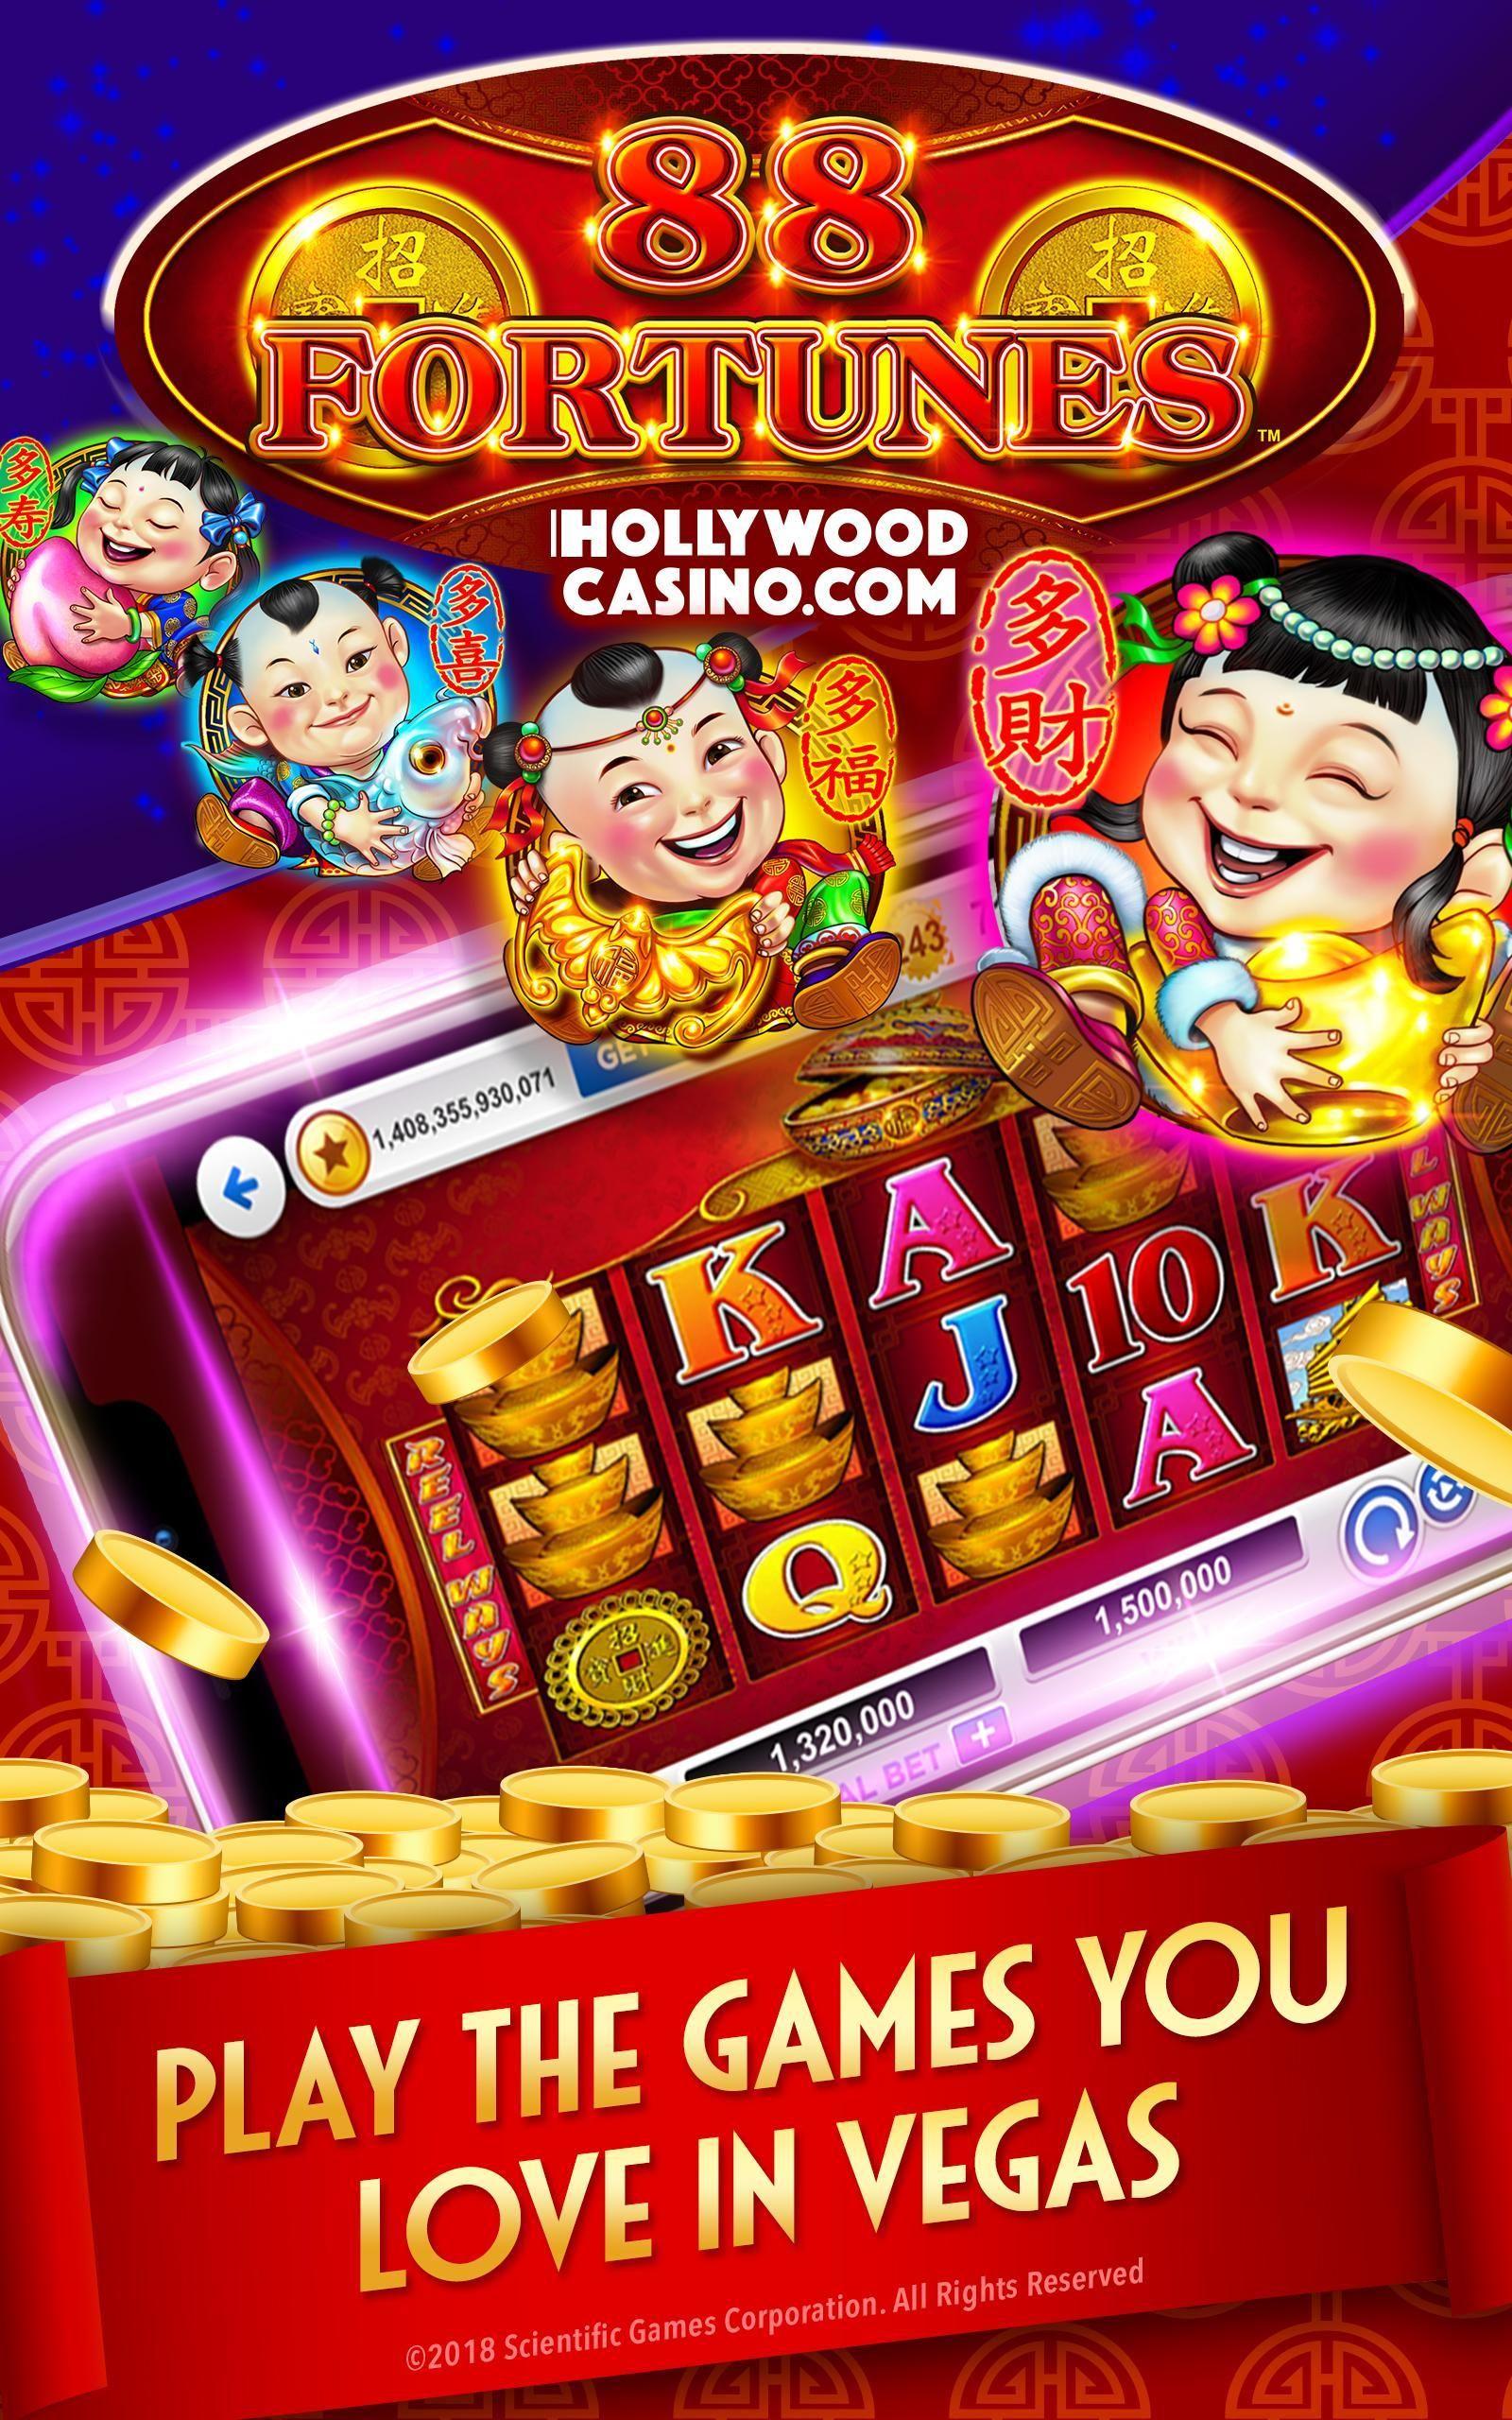 Noiq casino no deposit bonus pala casino earth wind and fire